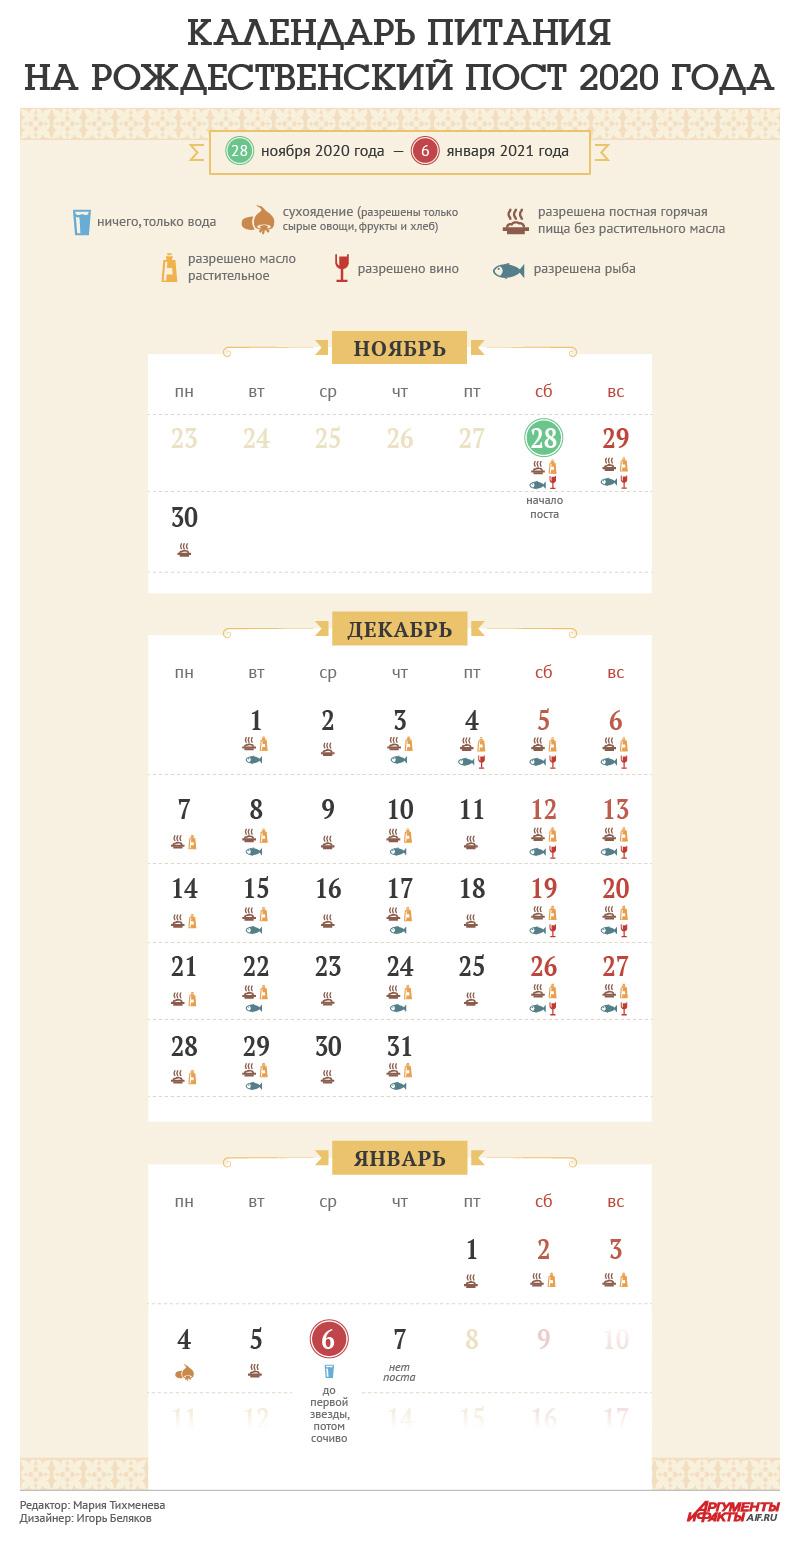 Календарь питания на пост